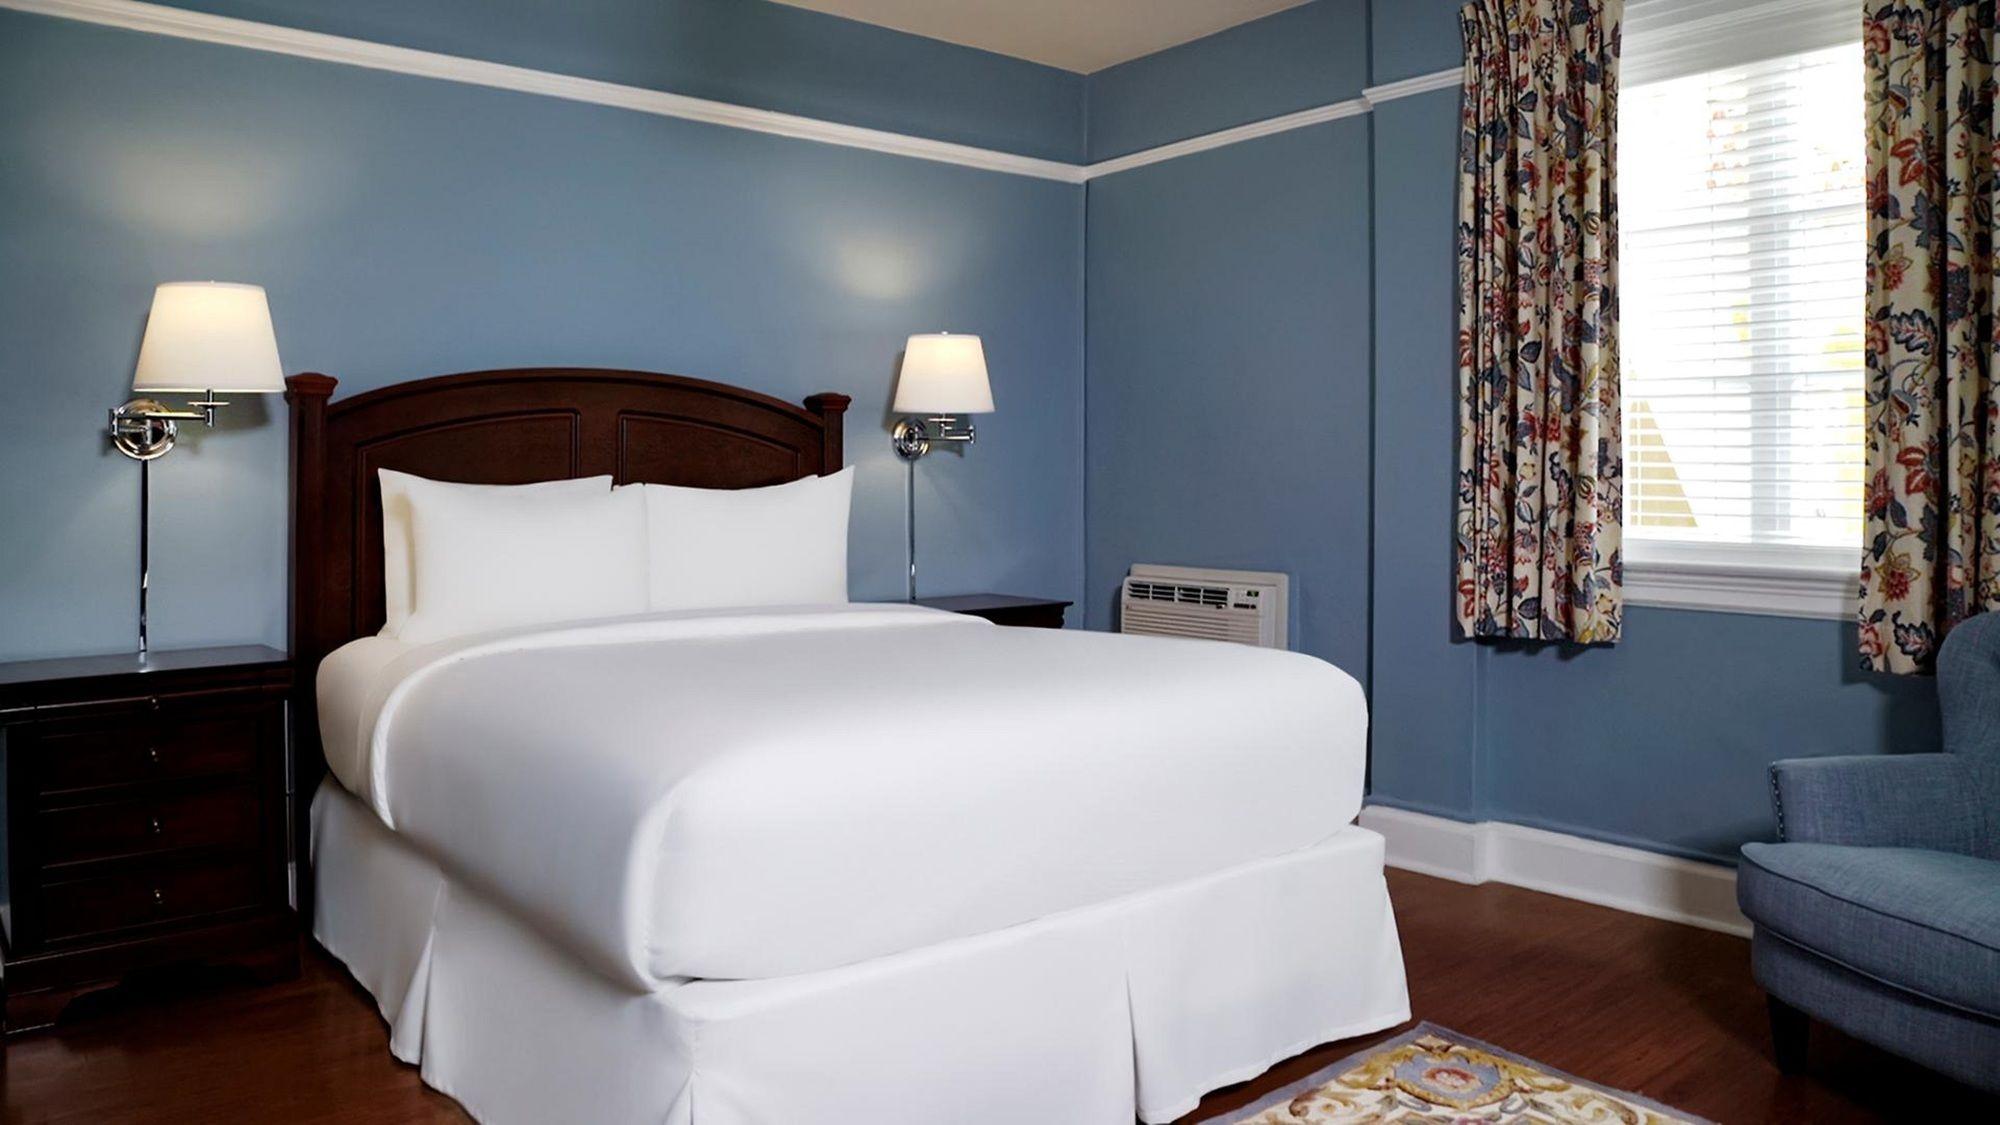 Bradley Park Hotel in Palm Beach, FL